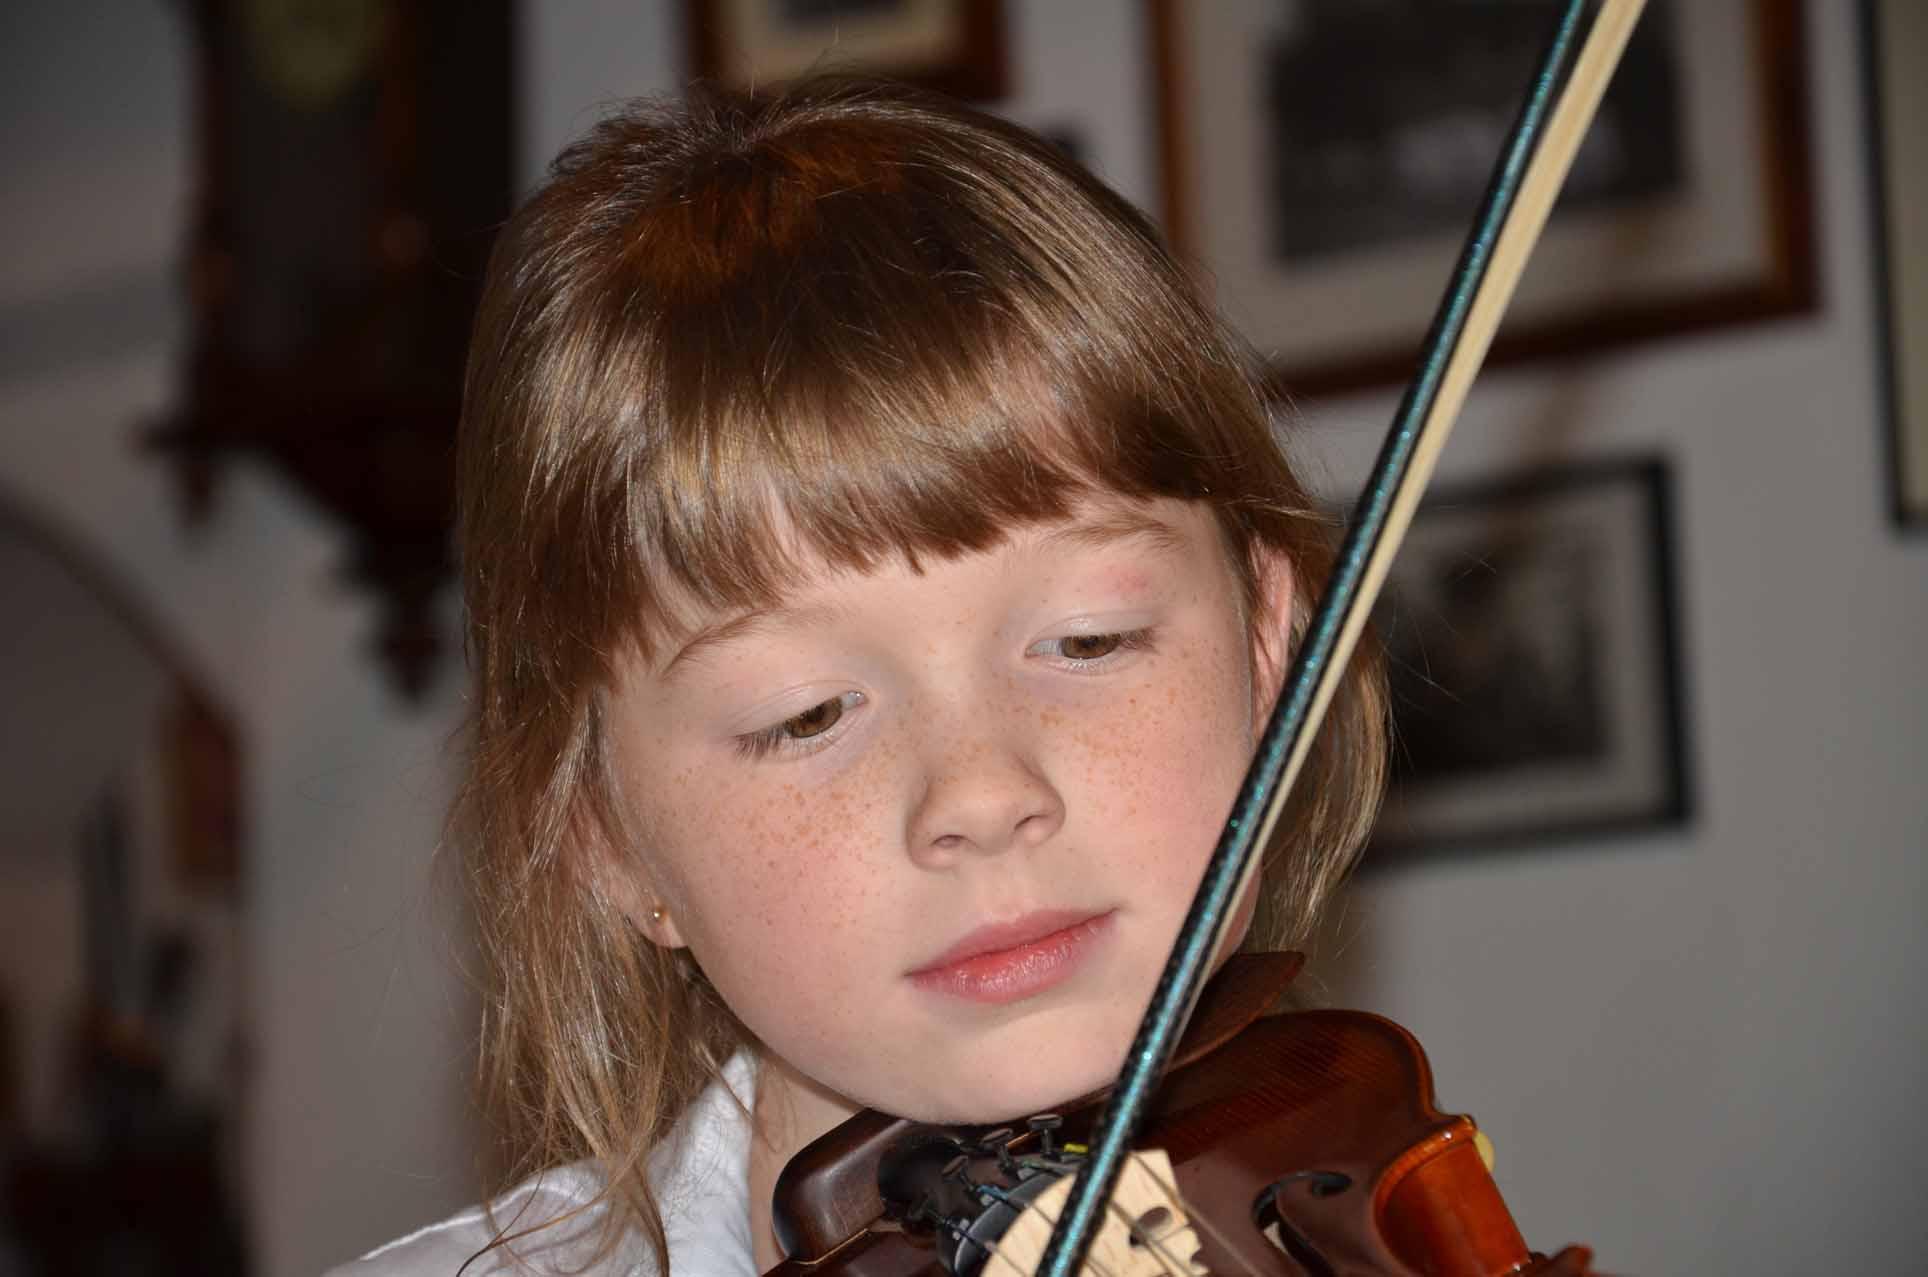 Katharina spielt den Polka